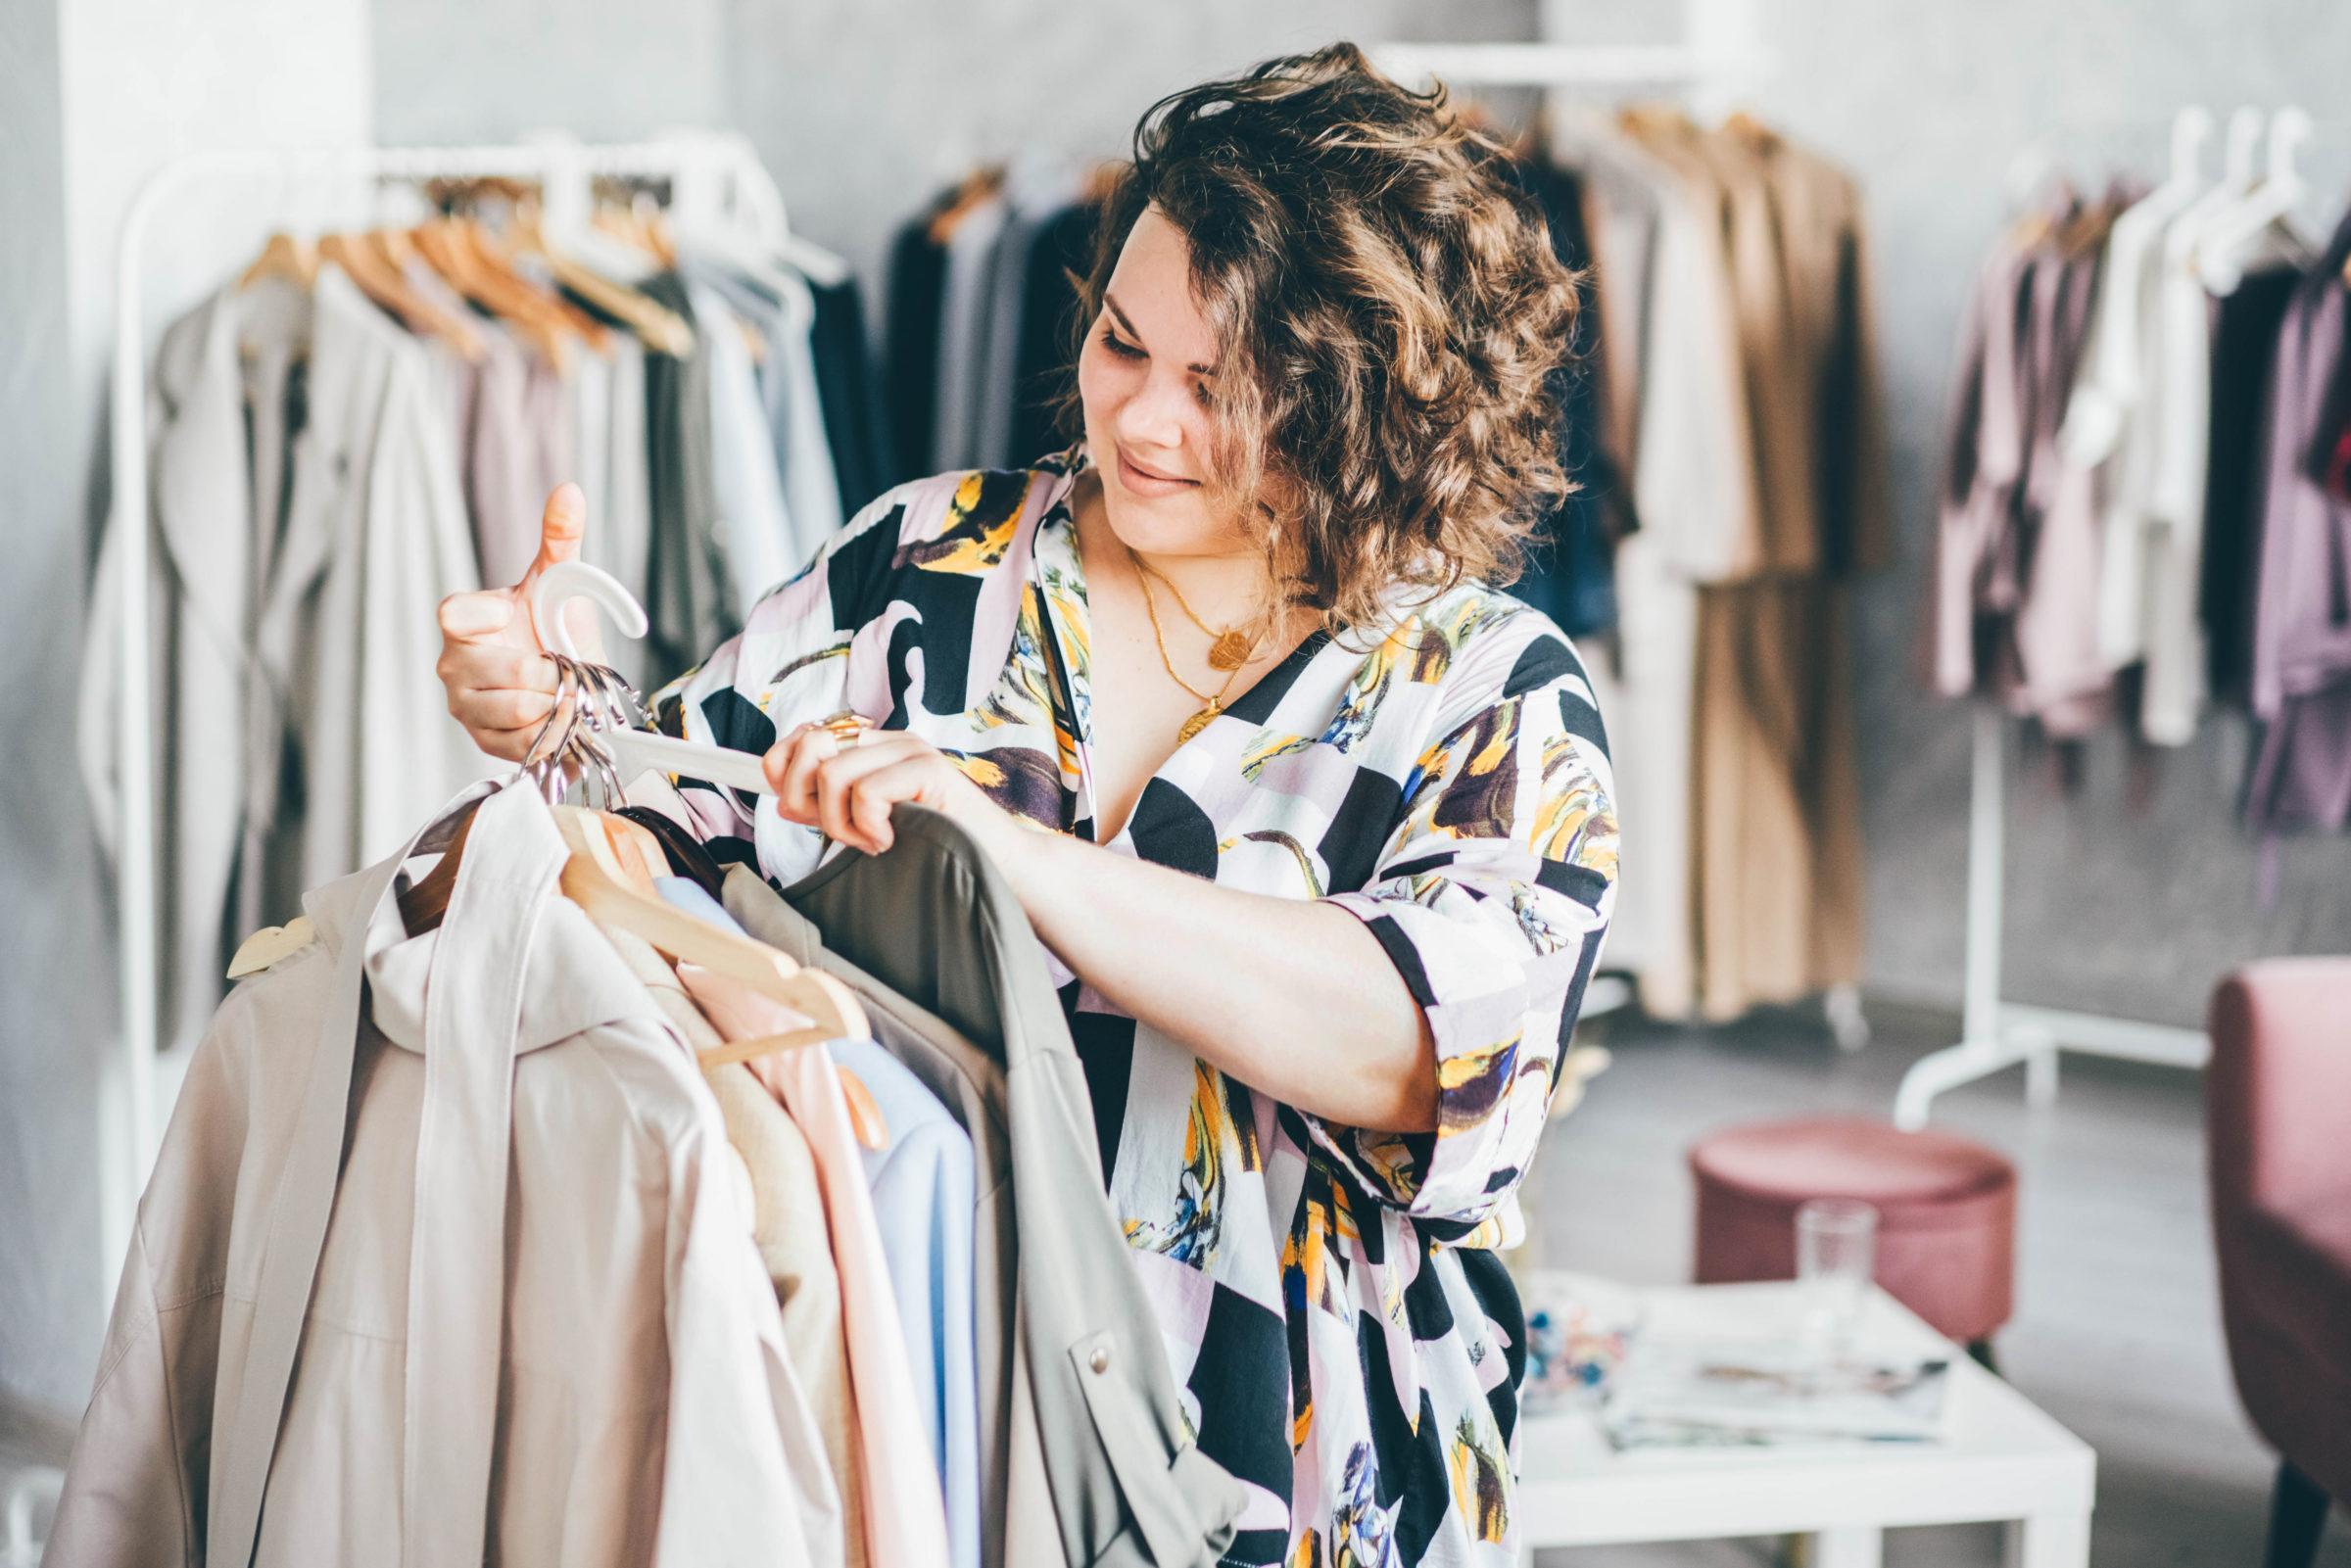 plus size woman choose fashioned dress in store pl 4MQLJGT